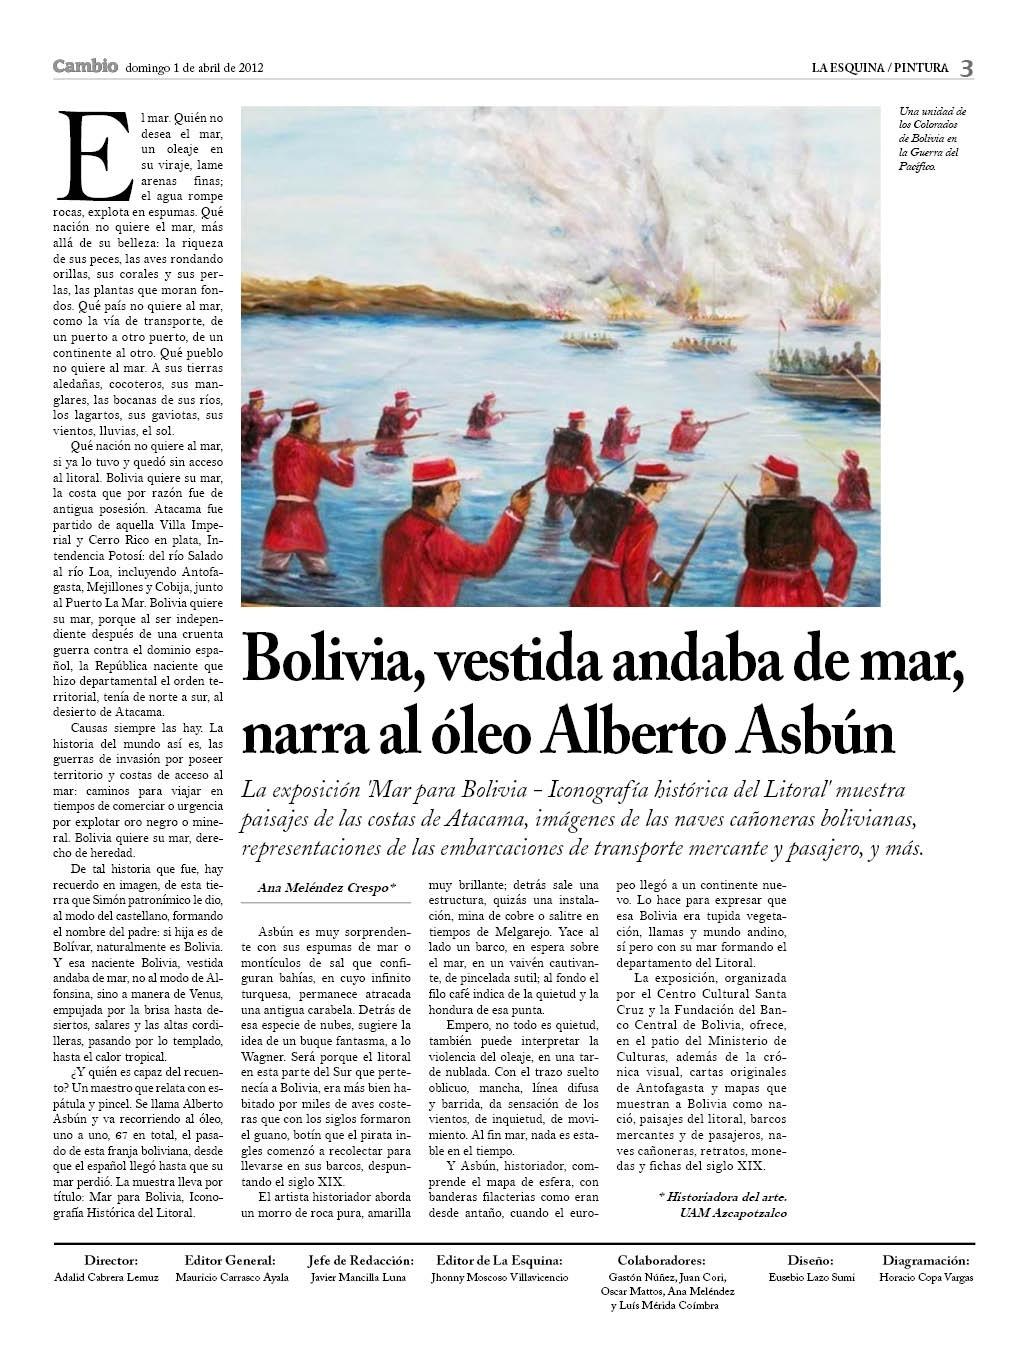 Bolivia, vestida andaba de mar, narra el oleo Alberto Ausbún